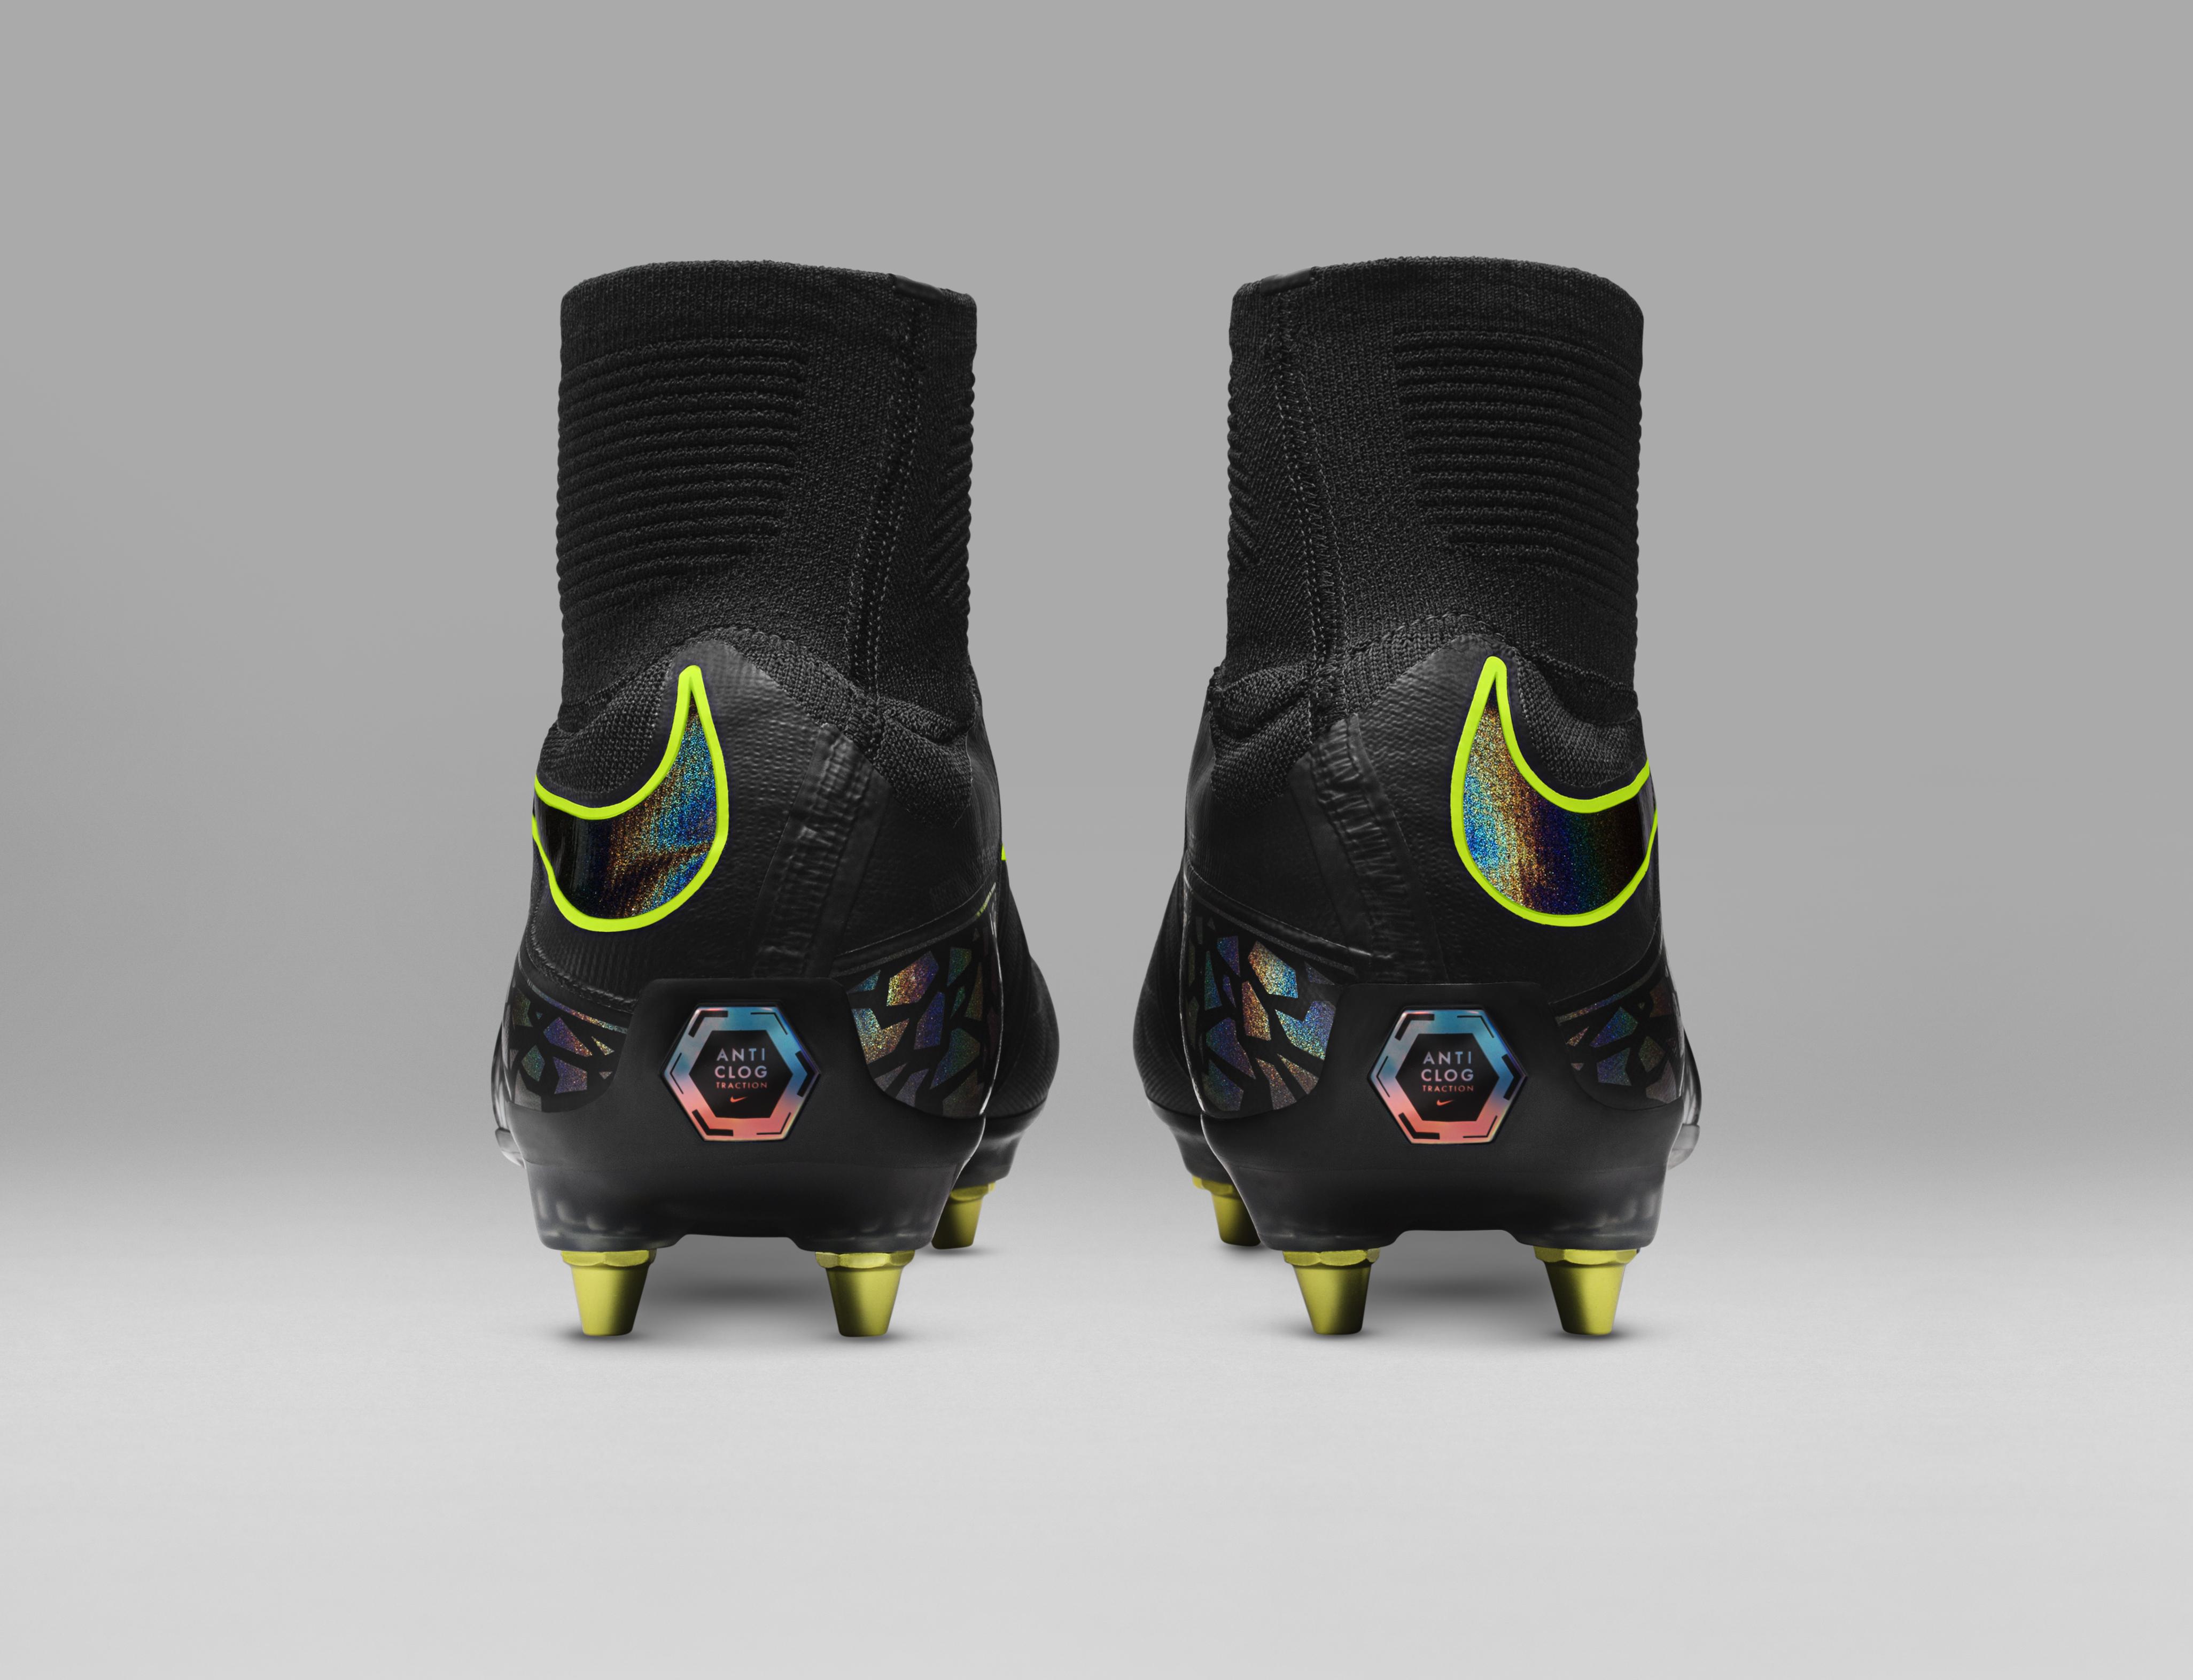 26df00d9c9ed Nike Anti-Clog Traction Nike Anti-Clog Traction - Nike News ...